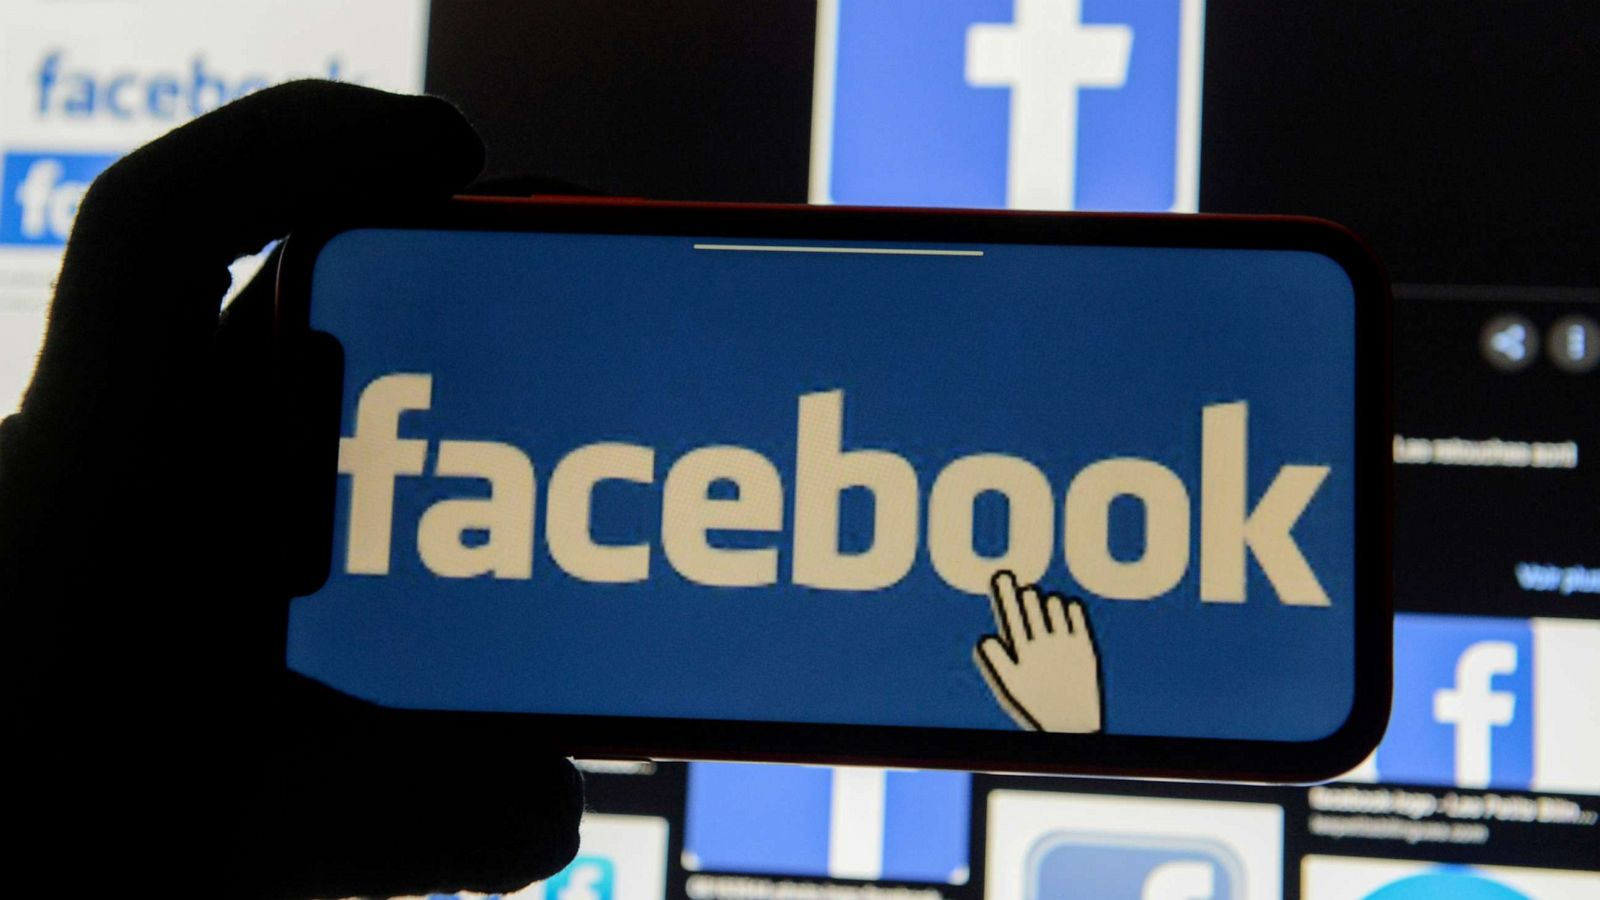 Facebook遭联邦贸易委员会及多个州联合起诉违反反垄断法